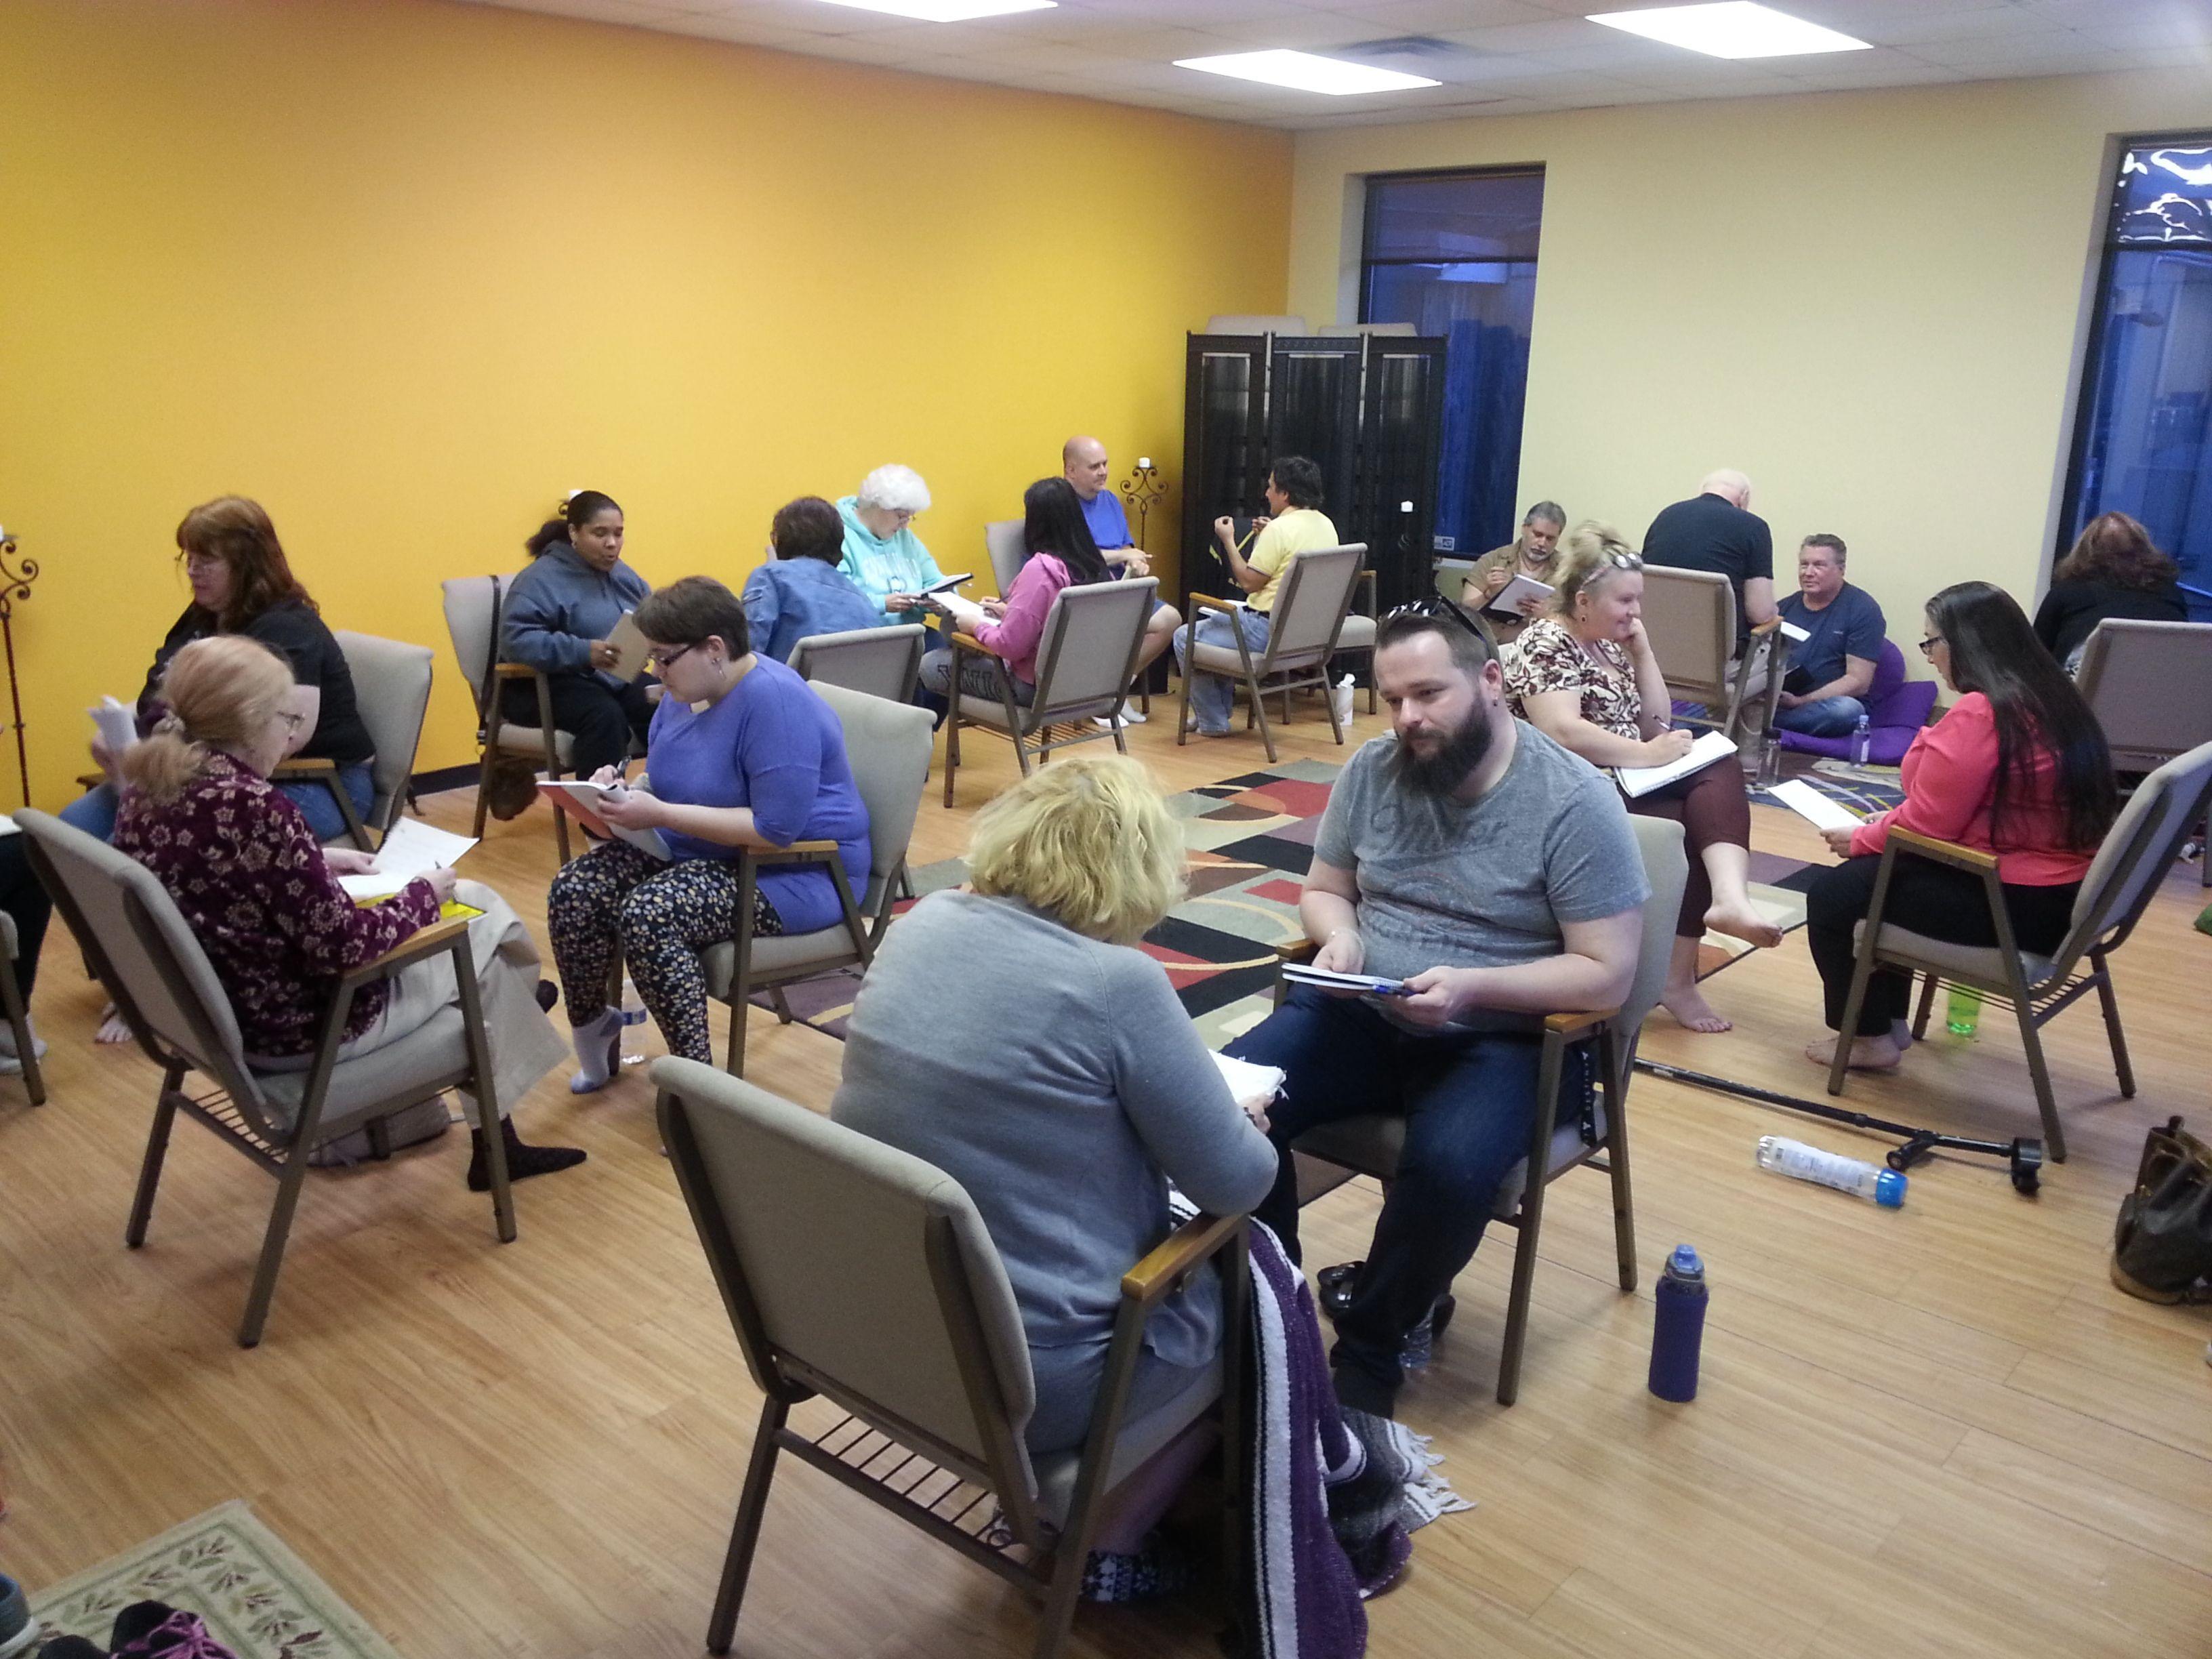 Psychic and Medium Development (Wilkes-Barre)